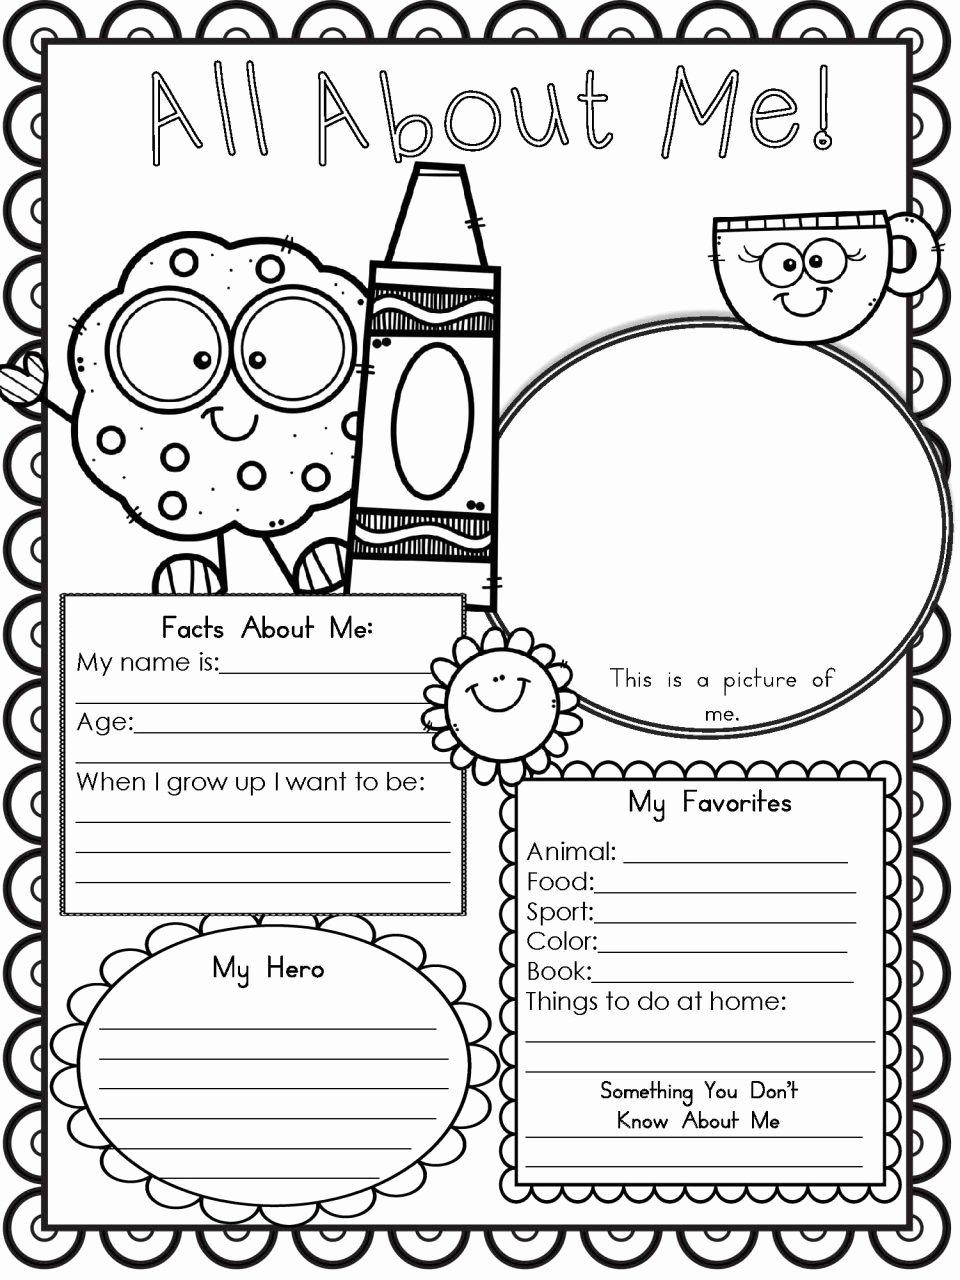 Summer Fun Worksheets for Preschoolers Lovely Worksheet Remarkable Funksheets for Preschoolers Image